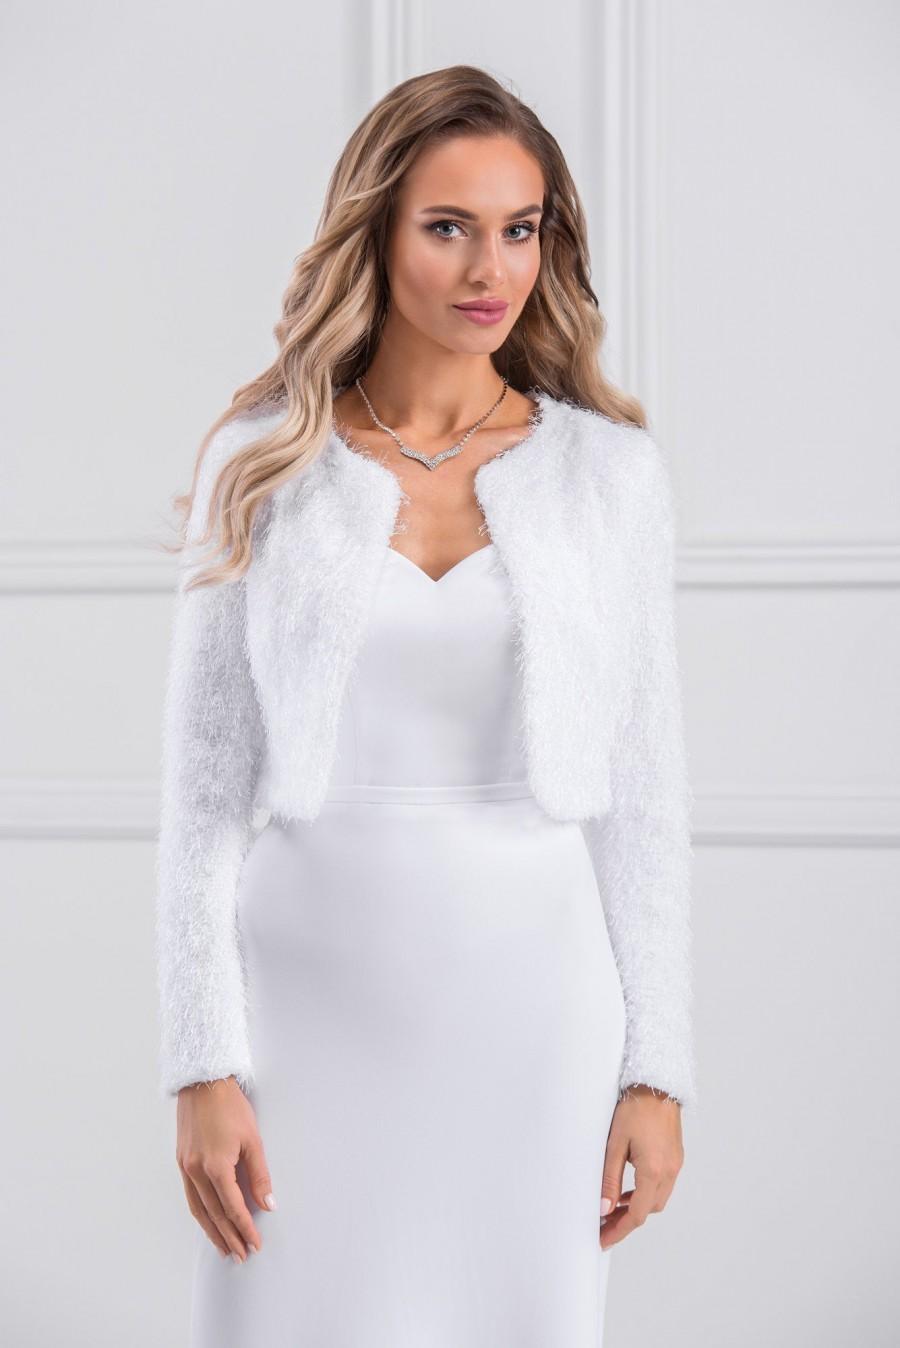 Mariage - Knit fabric Long Sleeve Warm Bridal Jacket in White or Ivory